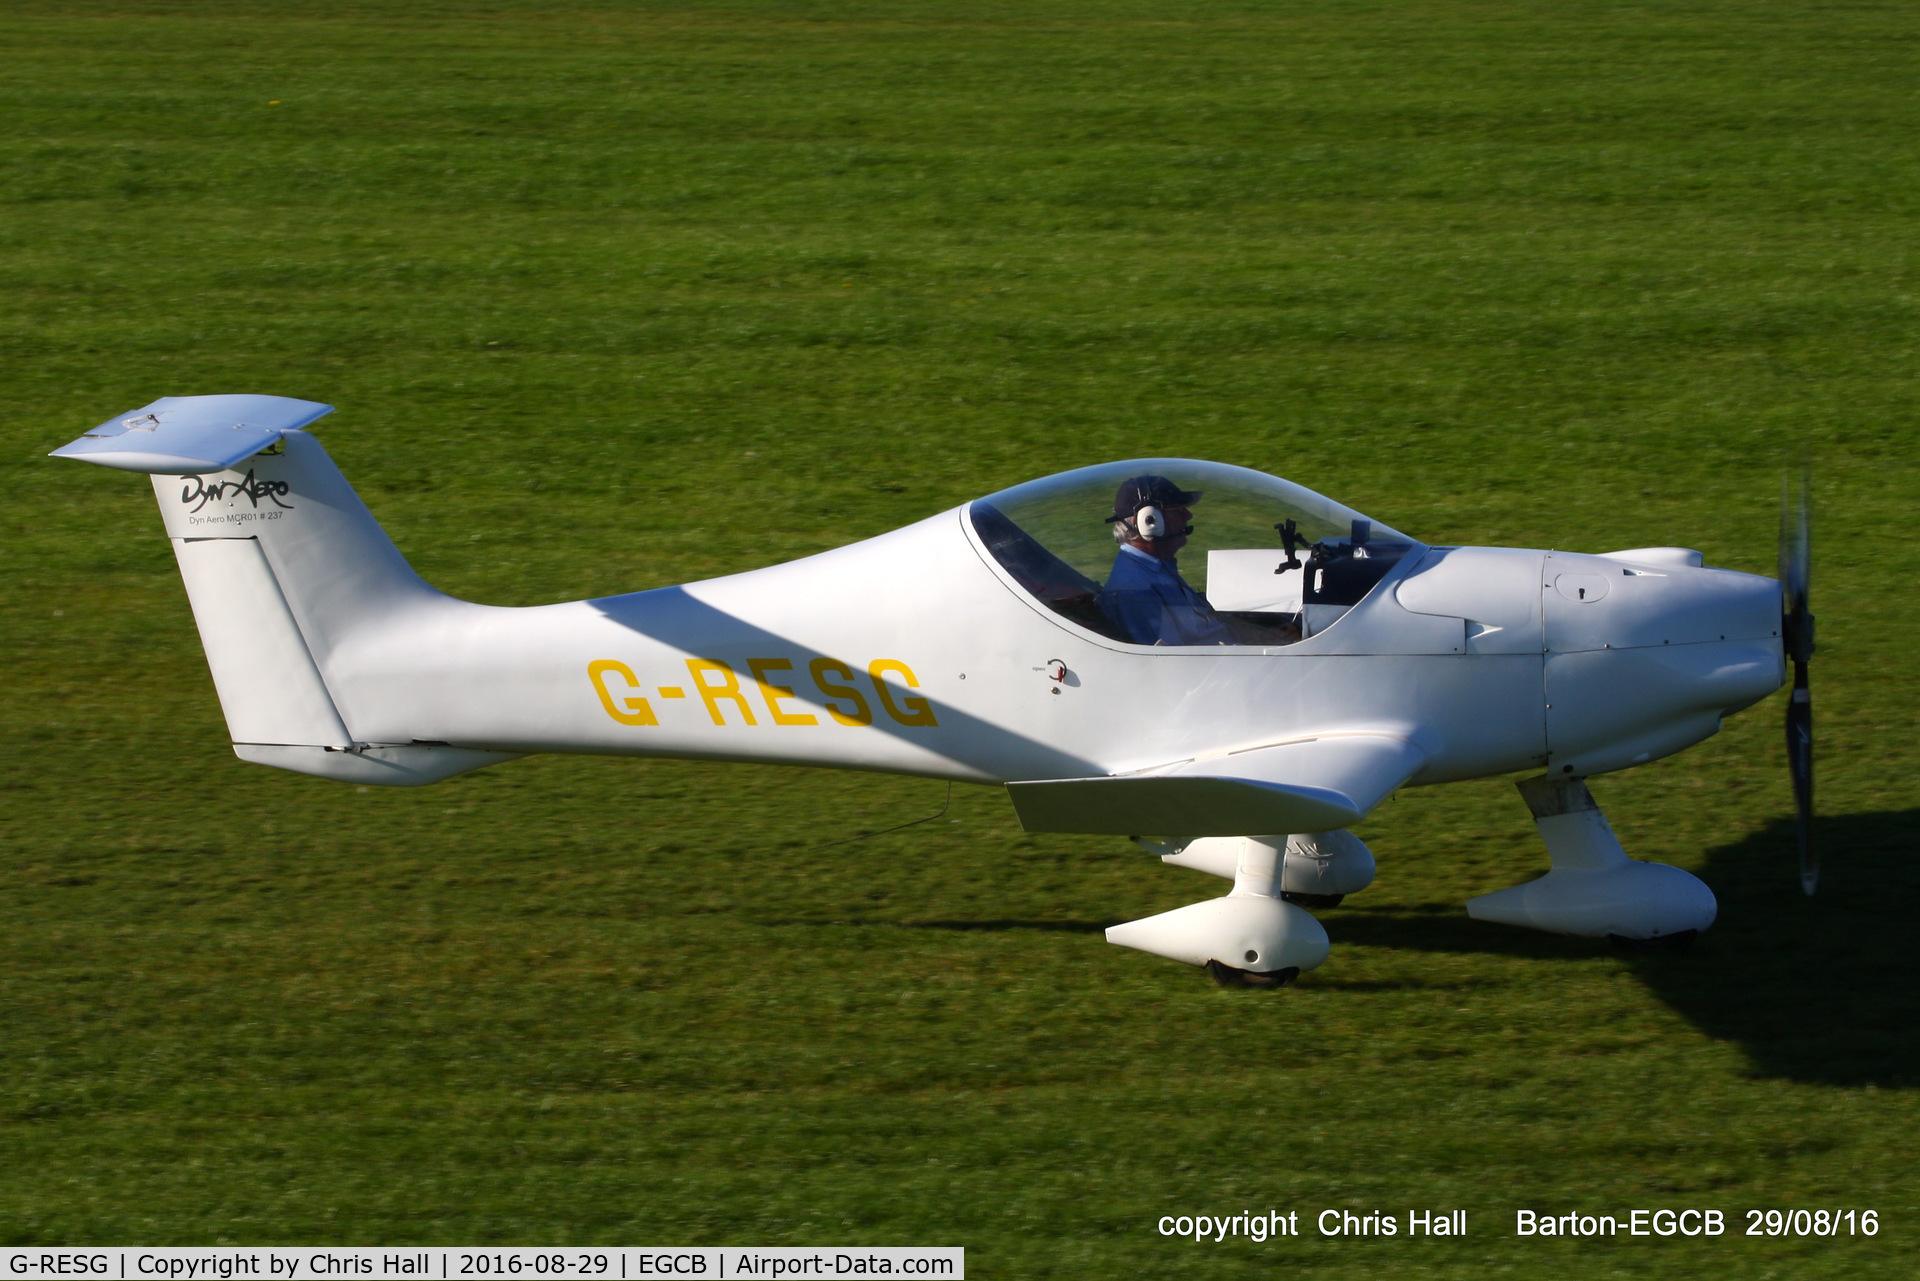 G-RESG, 2003 Dyn'Aero MCR-01 Club C/N PFA 301A-13994, at Barton